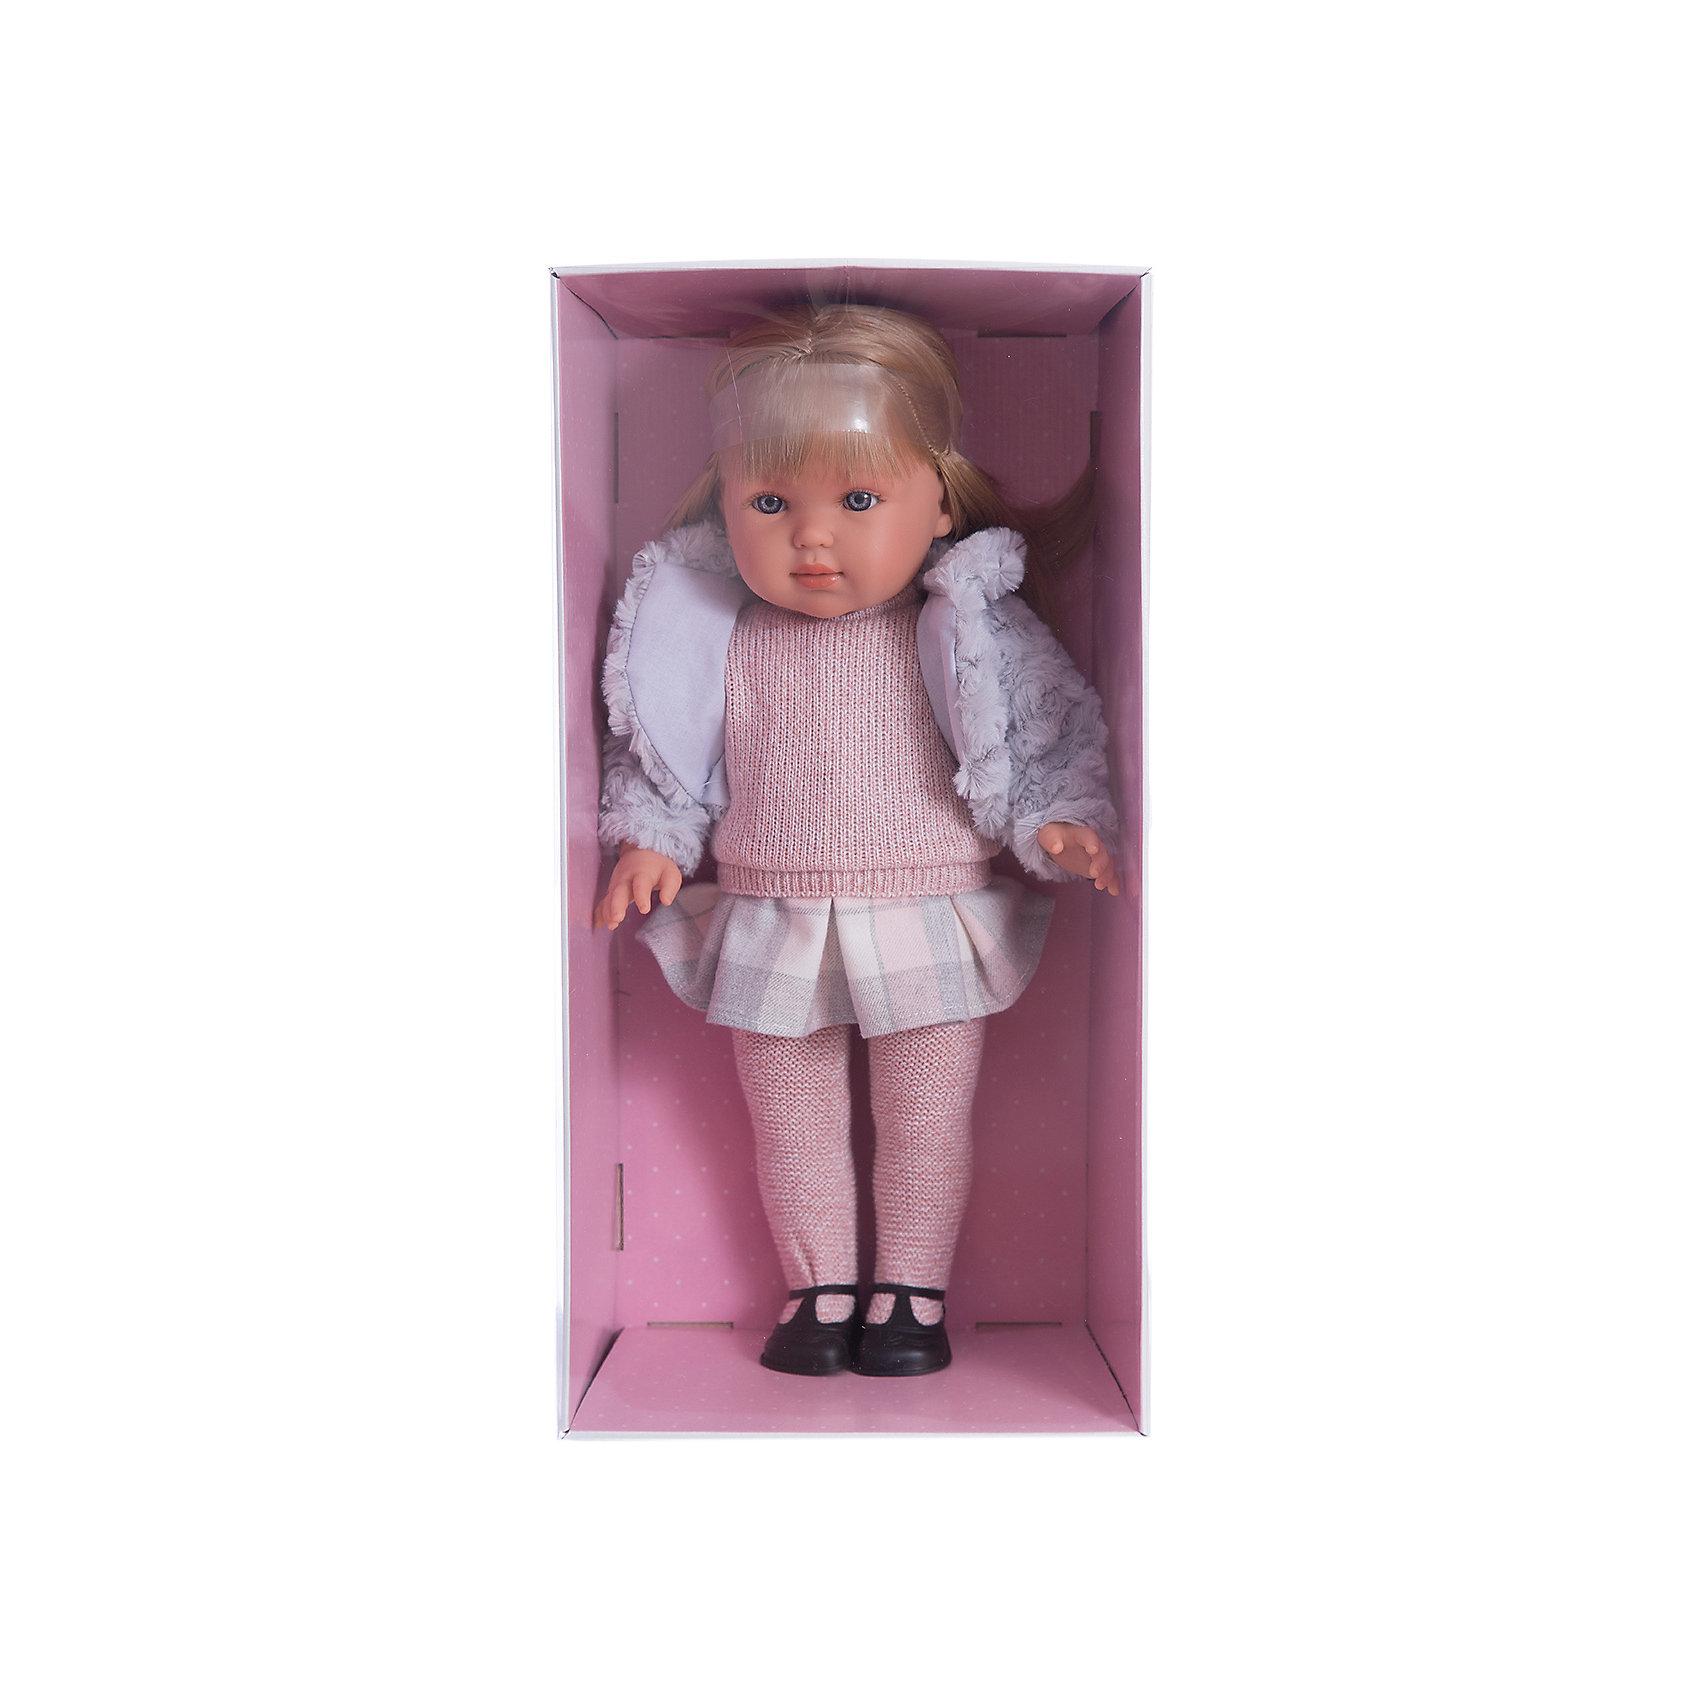 Llorens Кукла Лаура 45 см, Llorens llorens кукла лаура 45 см l 54514